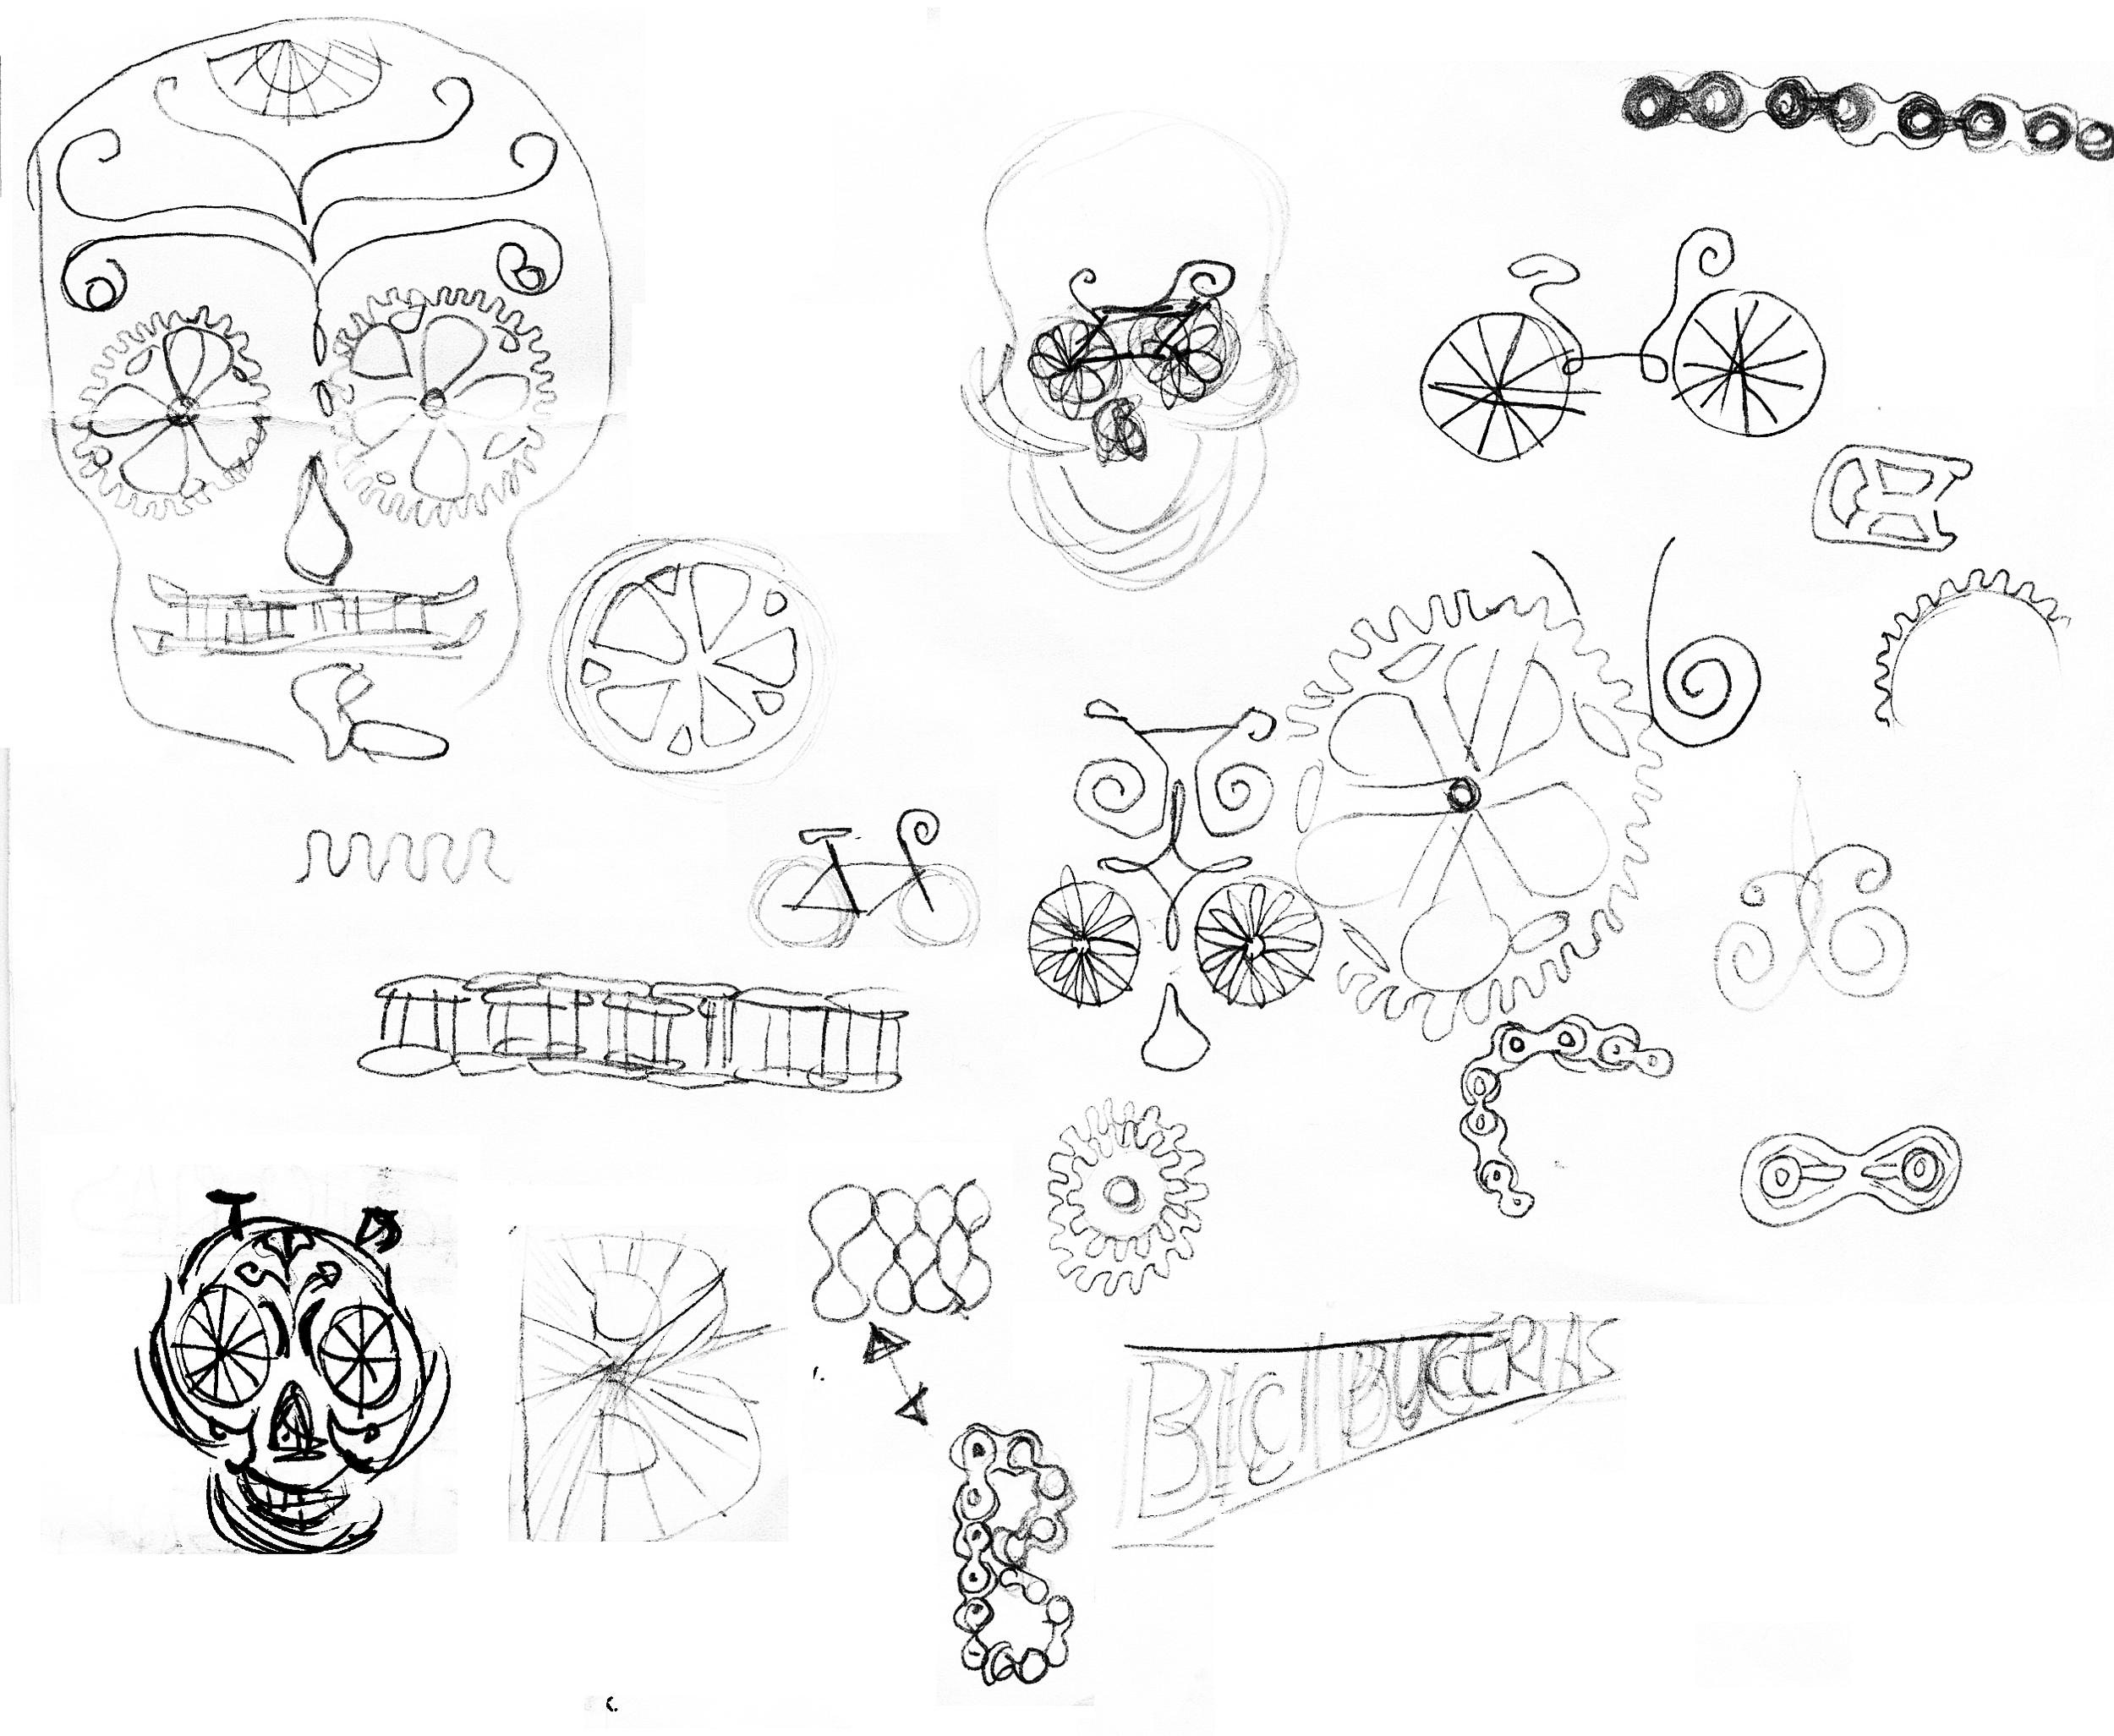 sugarskull_sketches.png